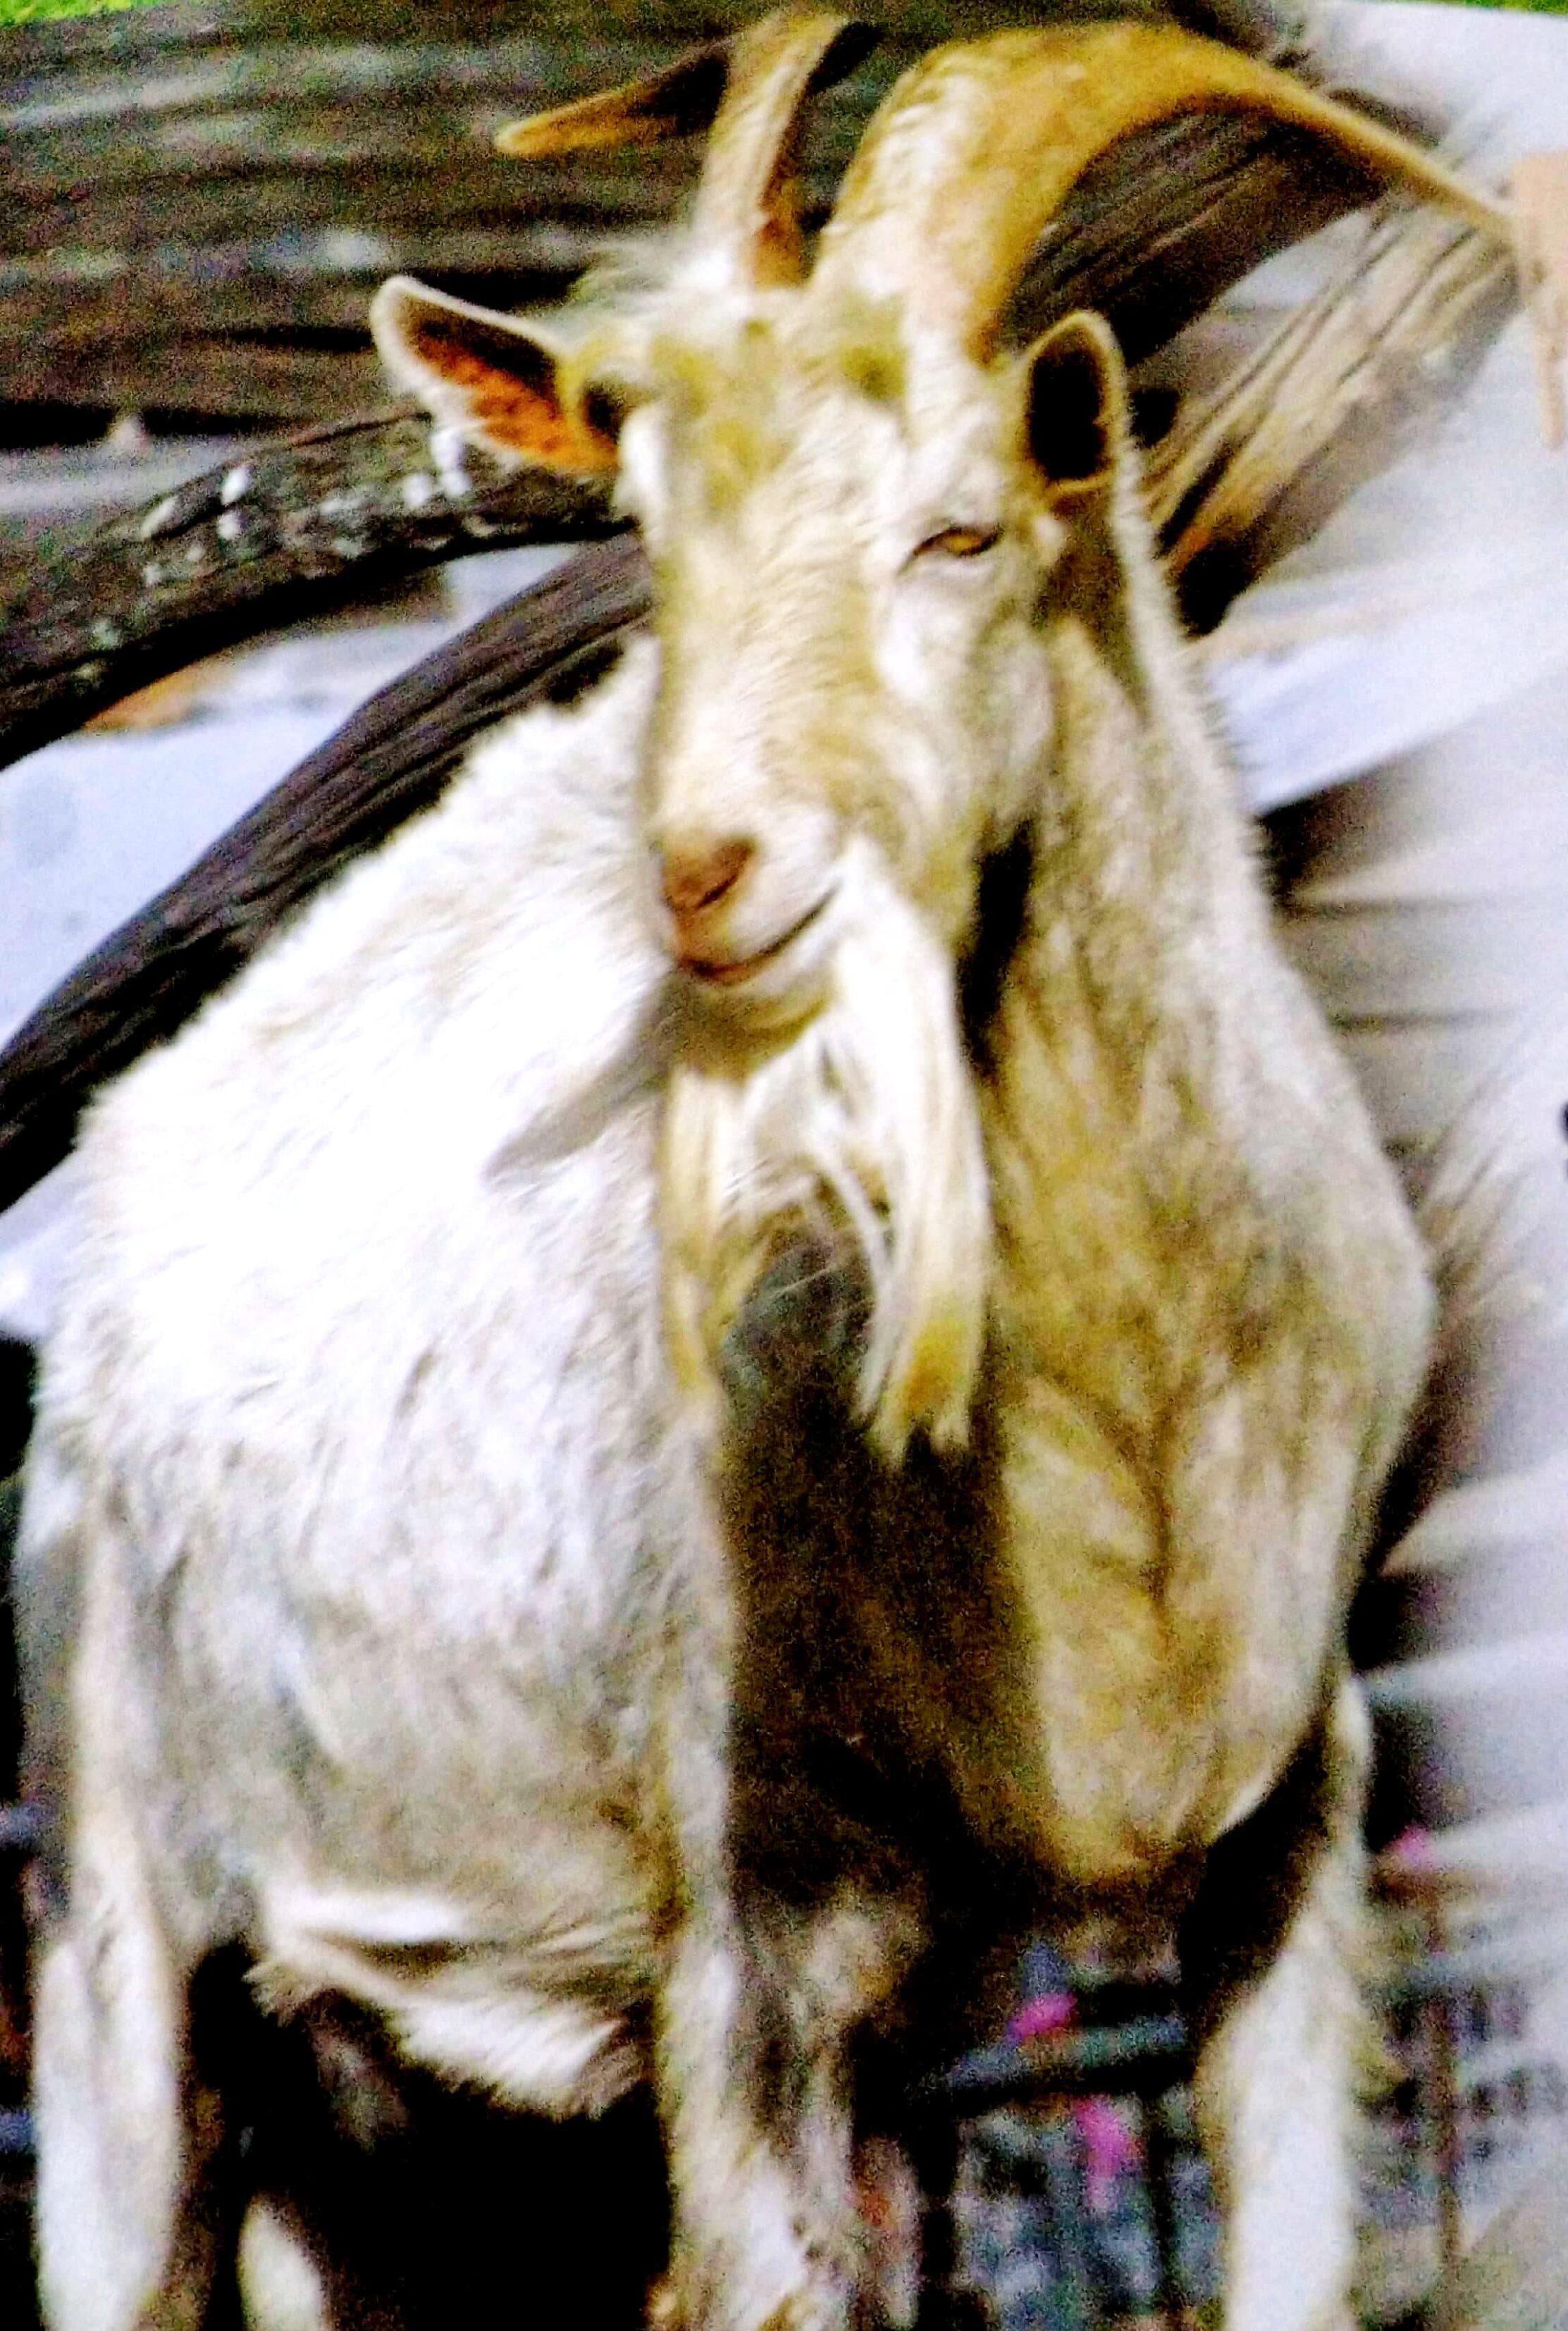 Farm animals-Goats